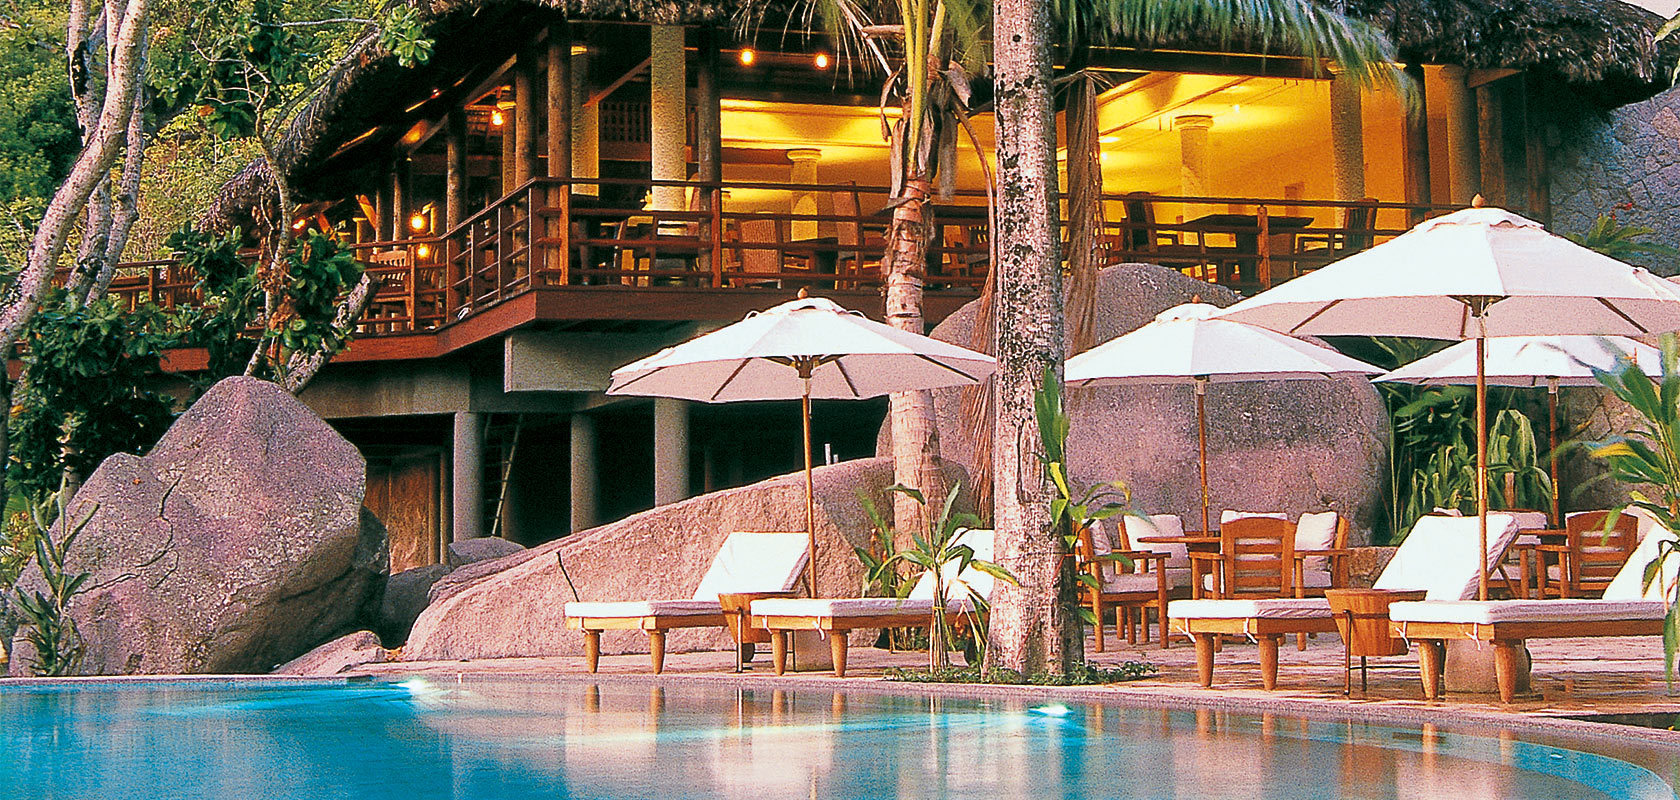 constance lemuria hotel job vacancy